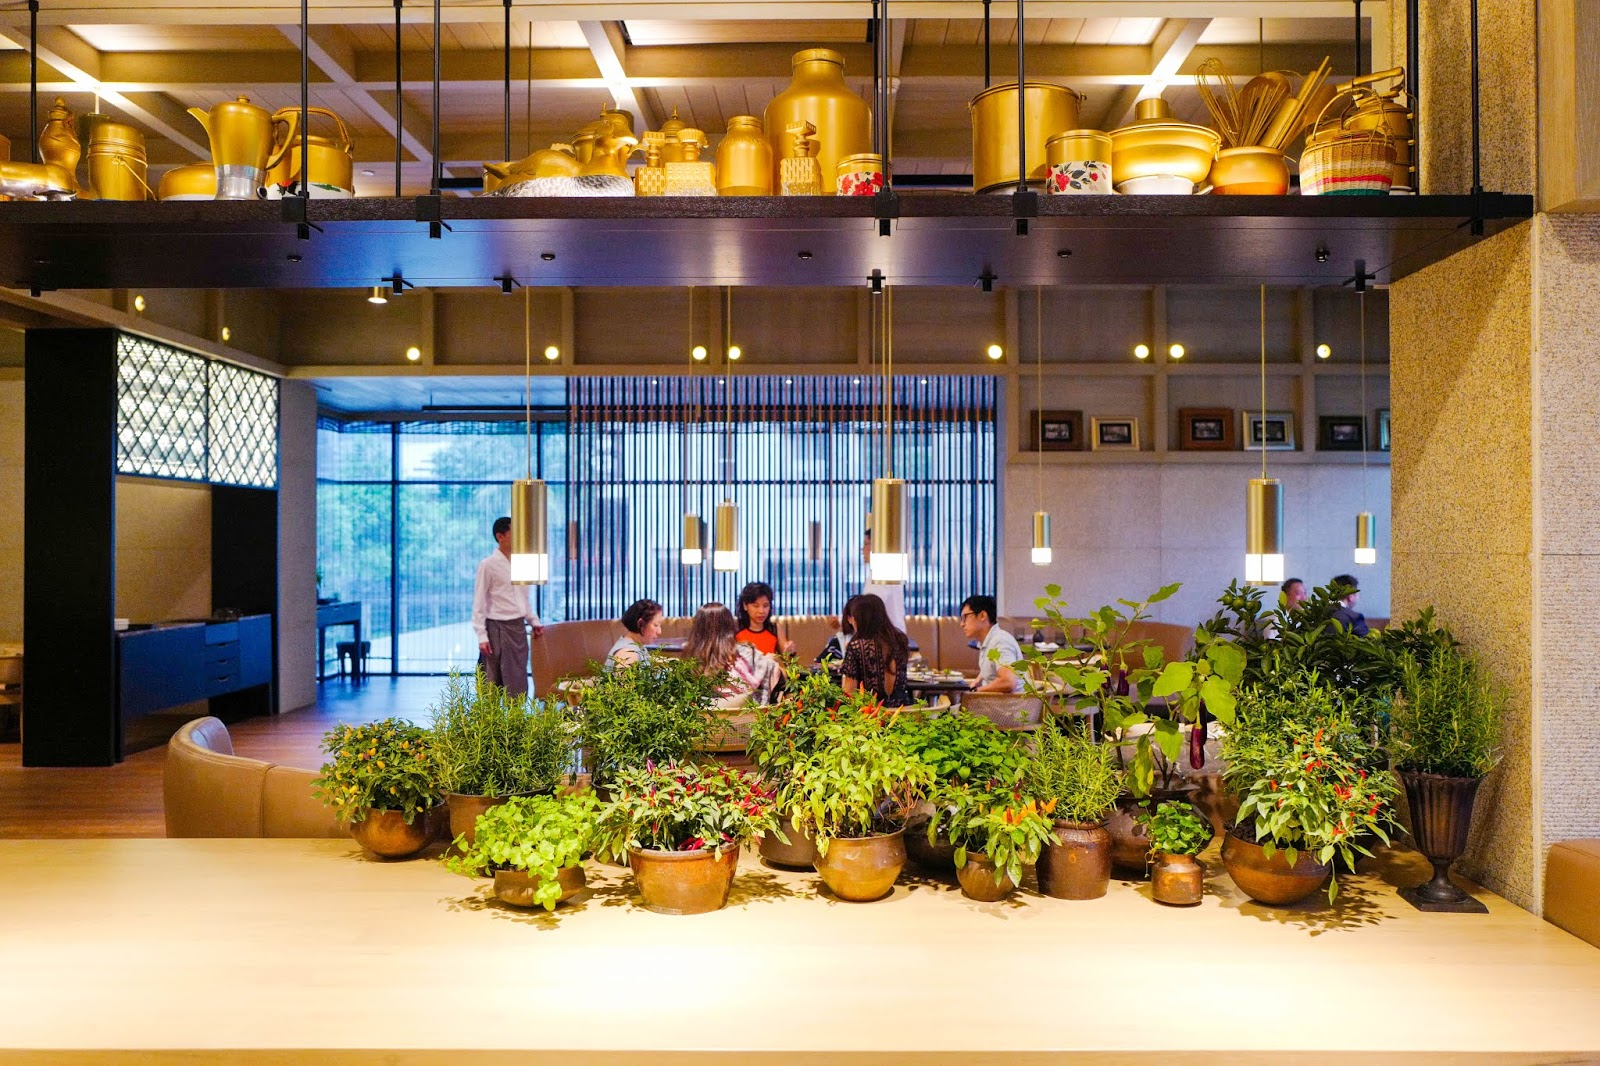 atas modern malaysian eatery, the ruma hotel & residences